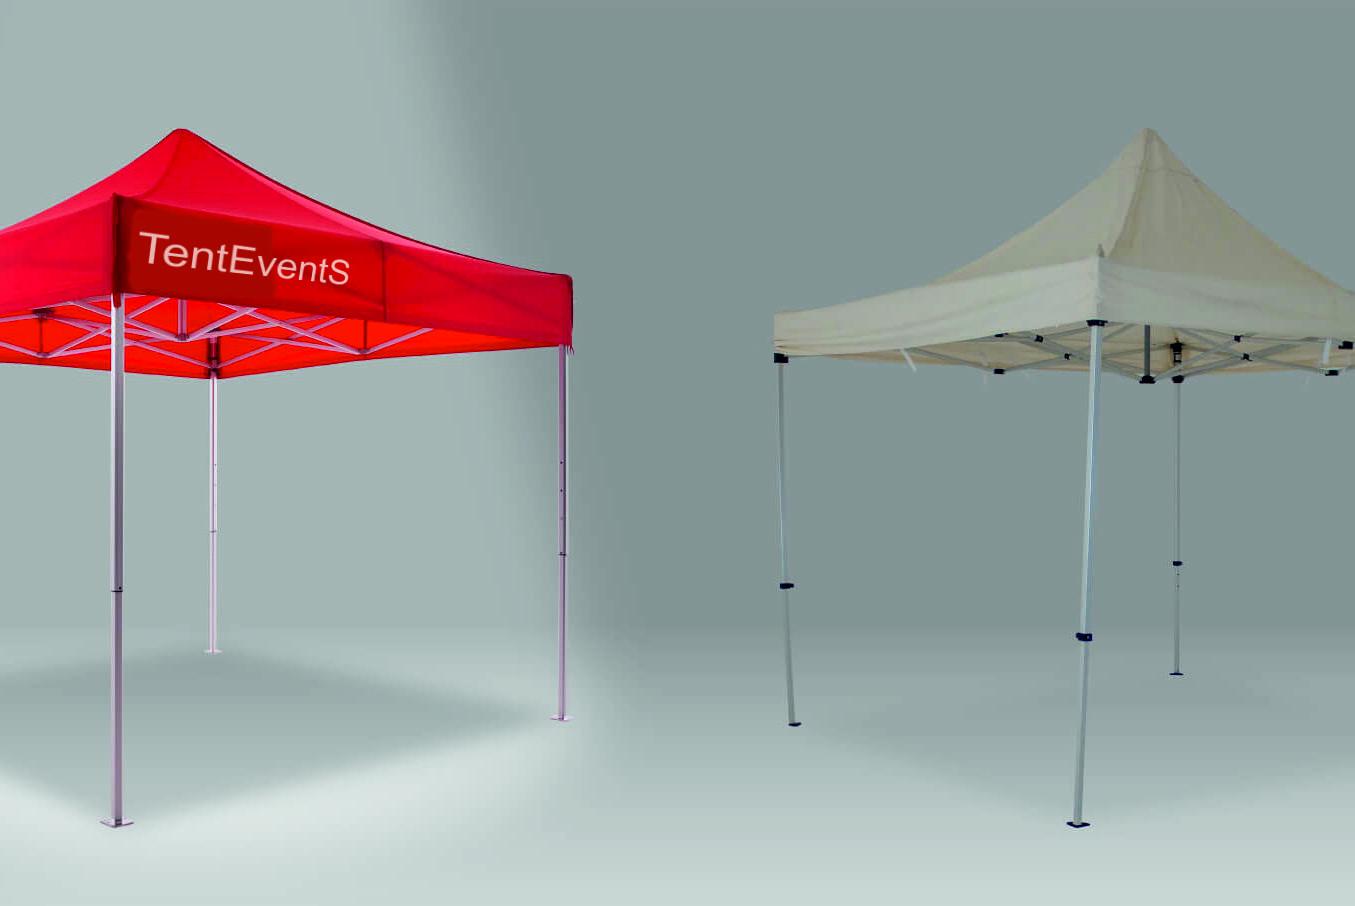 Сравнение шатров TentEventS c китайскими аналогами (версия 2.0)